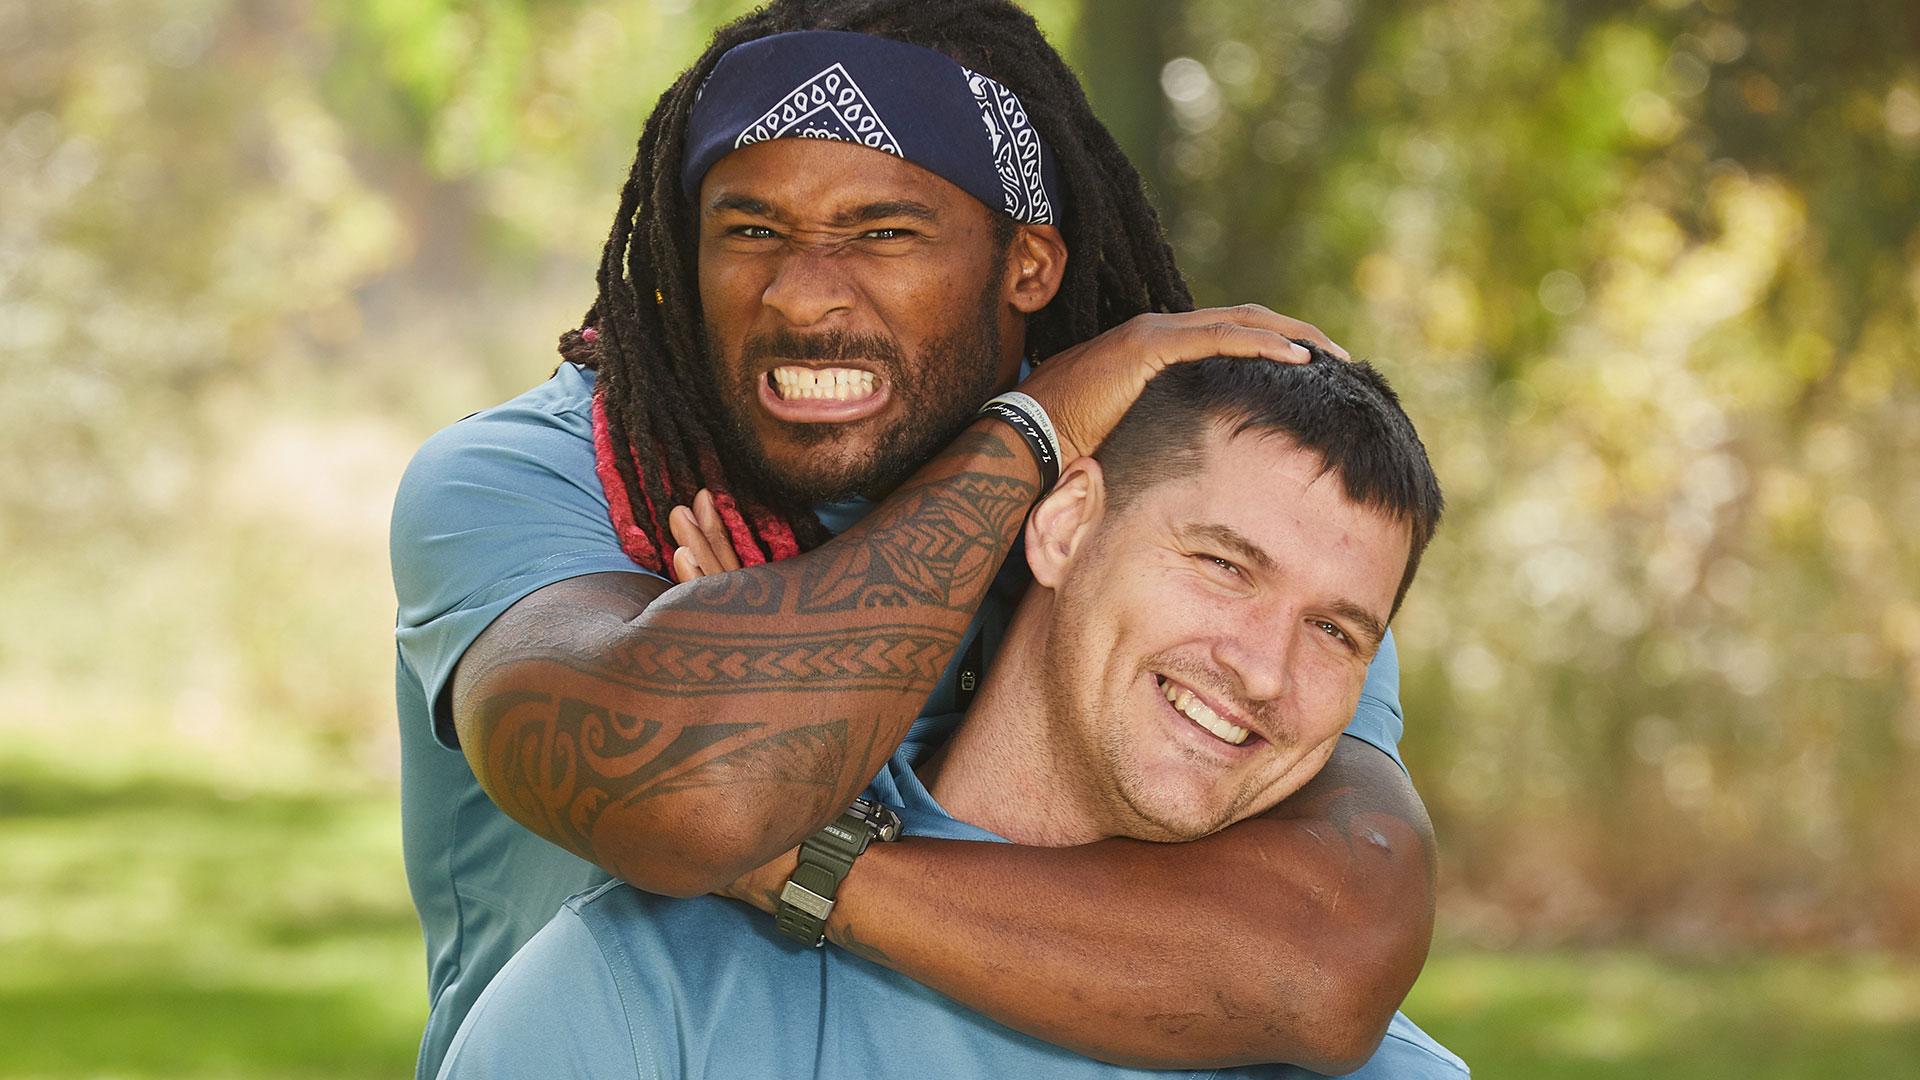 Gary and DeAngelo (former NFL stars)